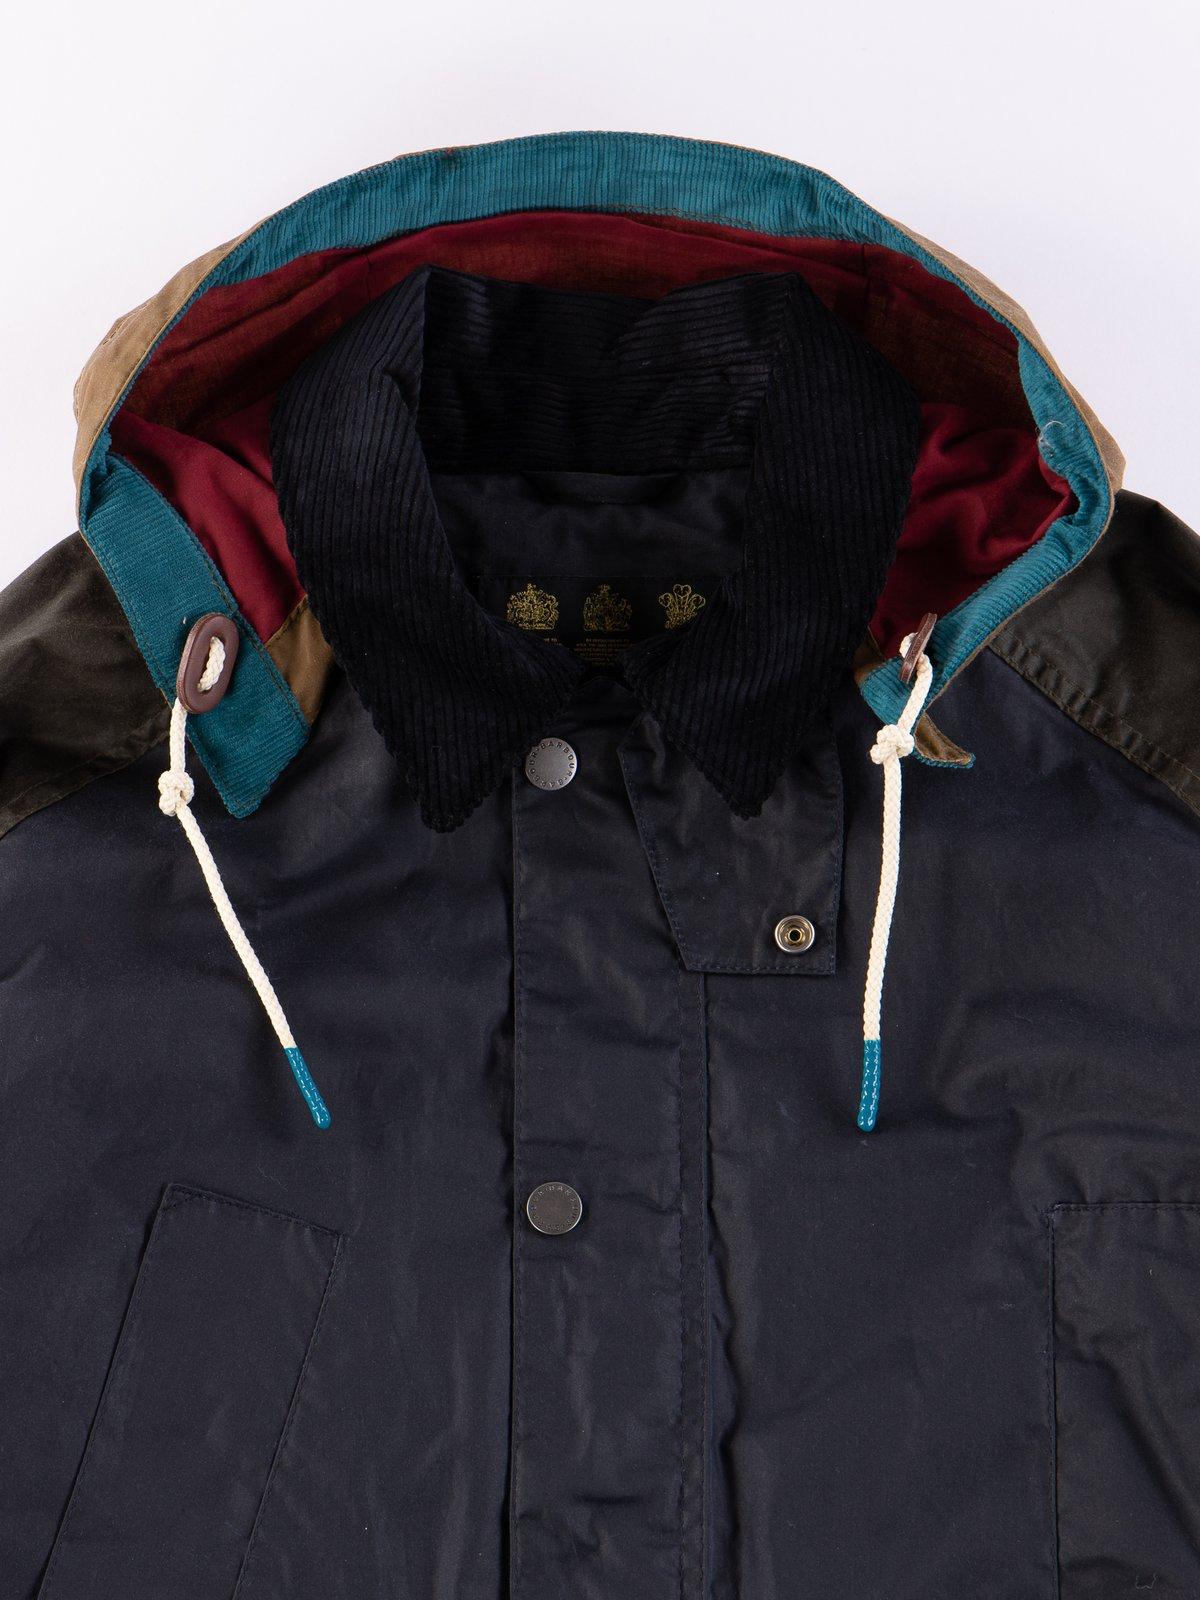 Multi Pitt Wax Jacket - Image 3